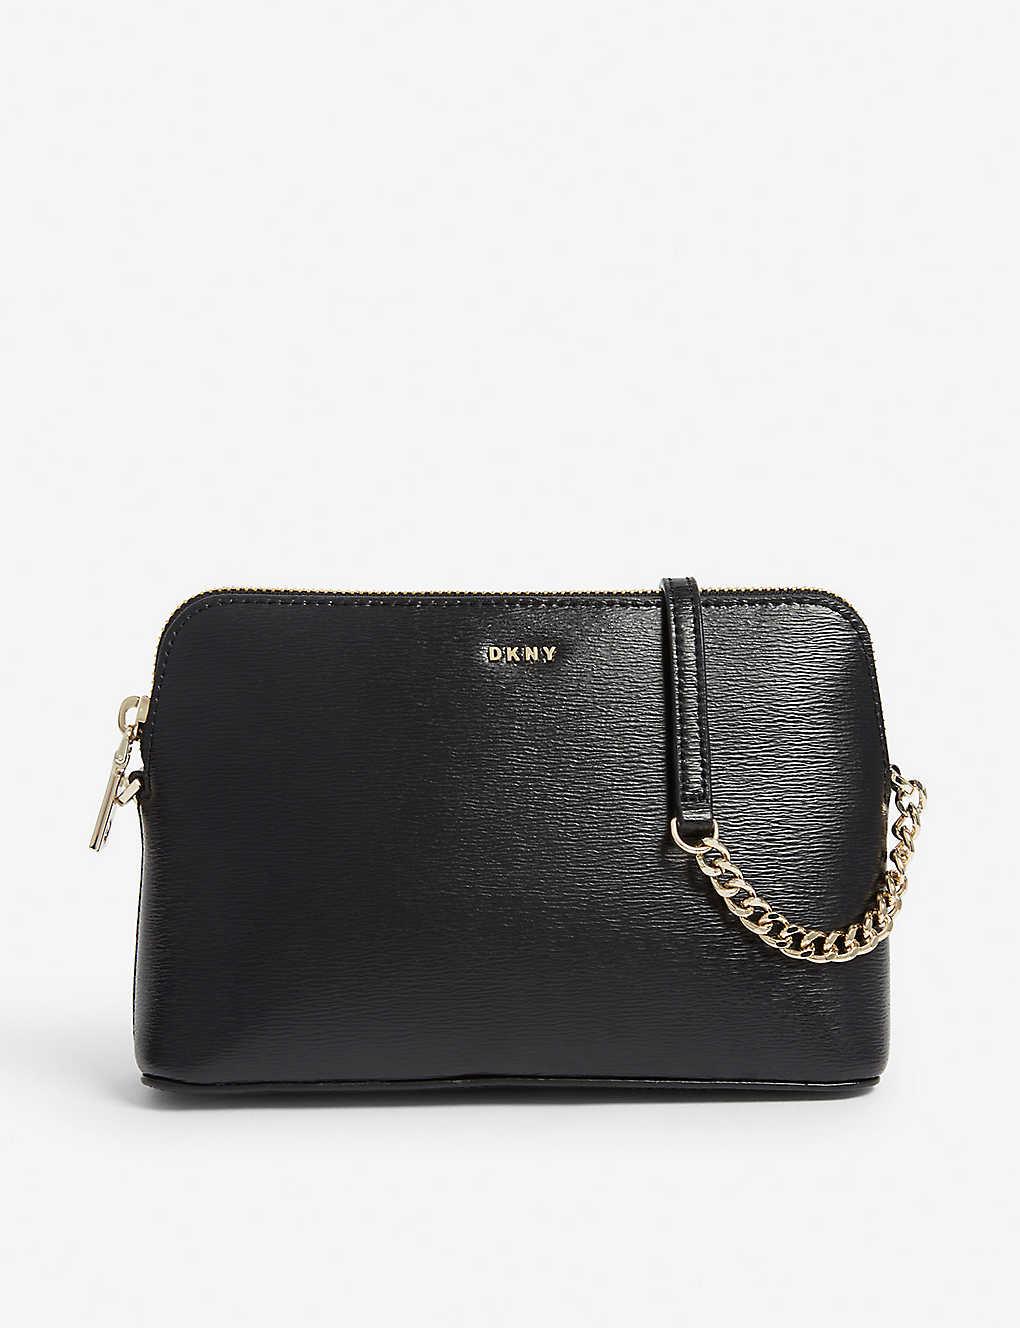 72e9d231e22 DKNY - Bryant saffiano leather cross-body bag